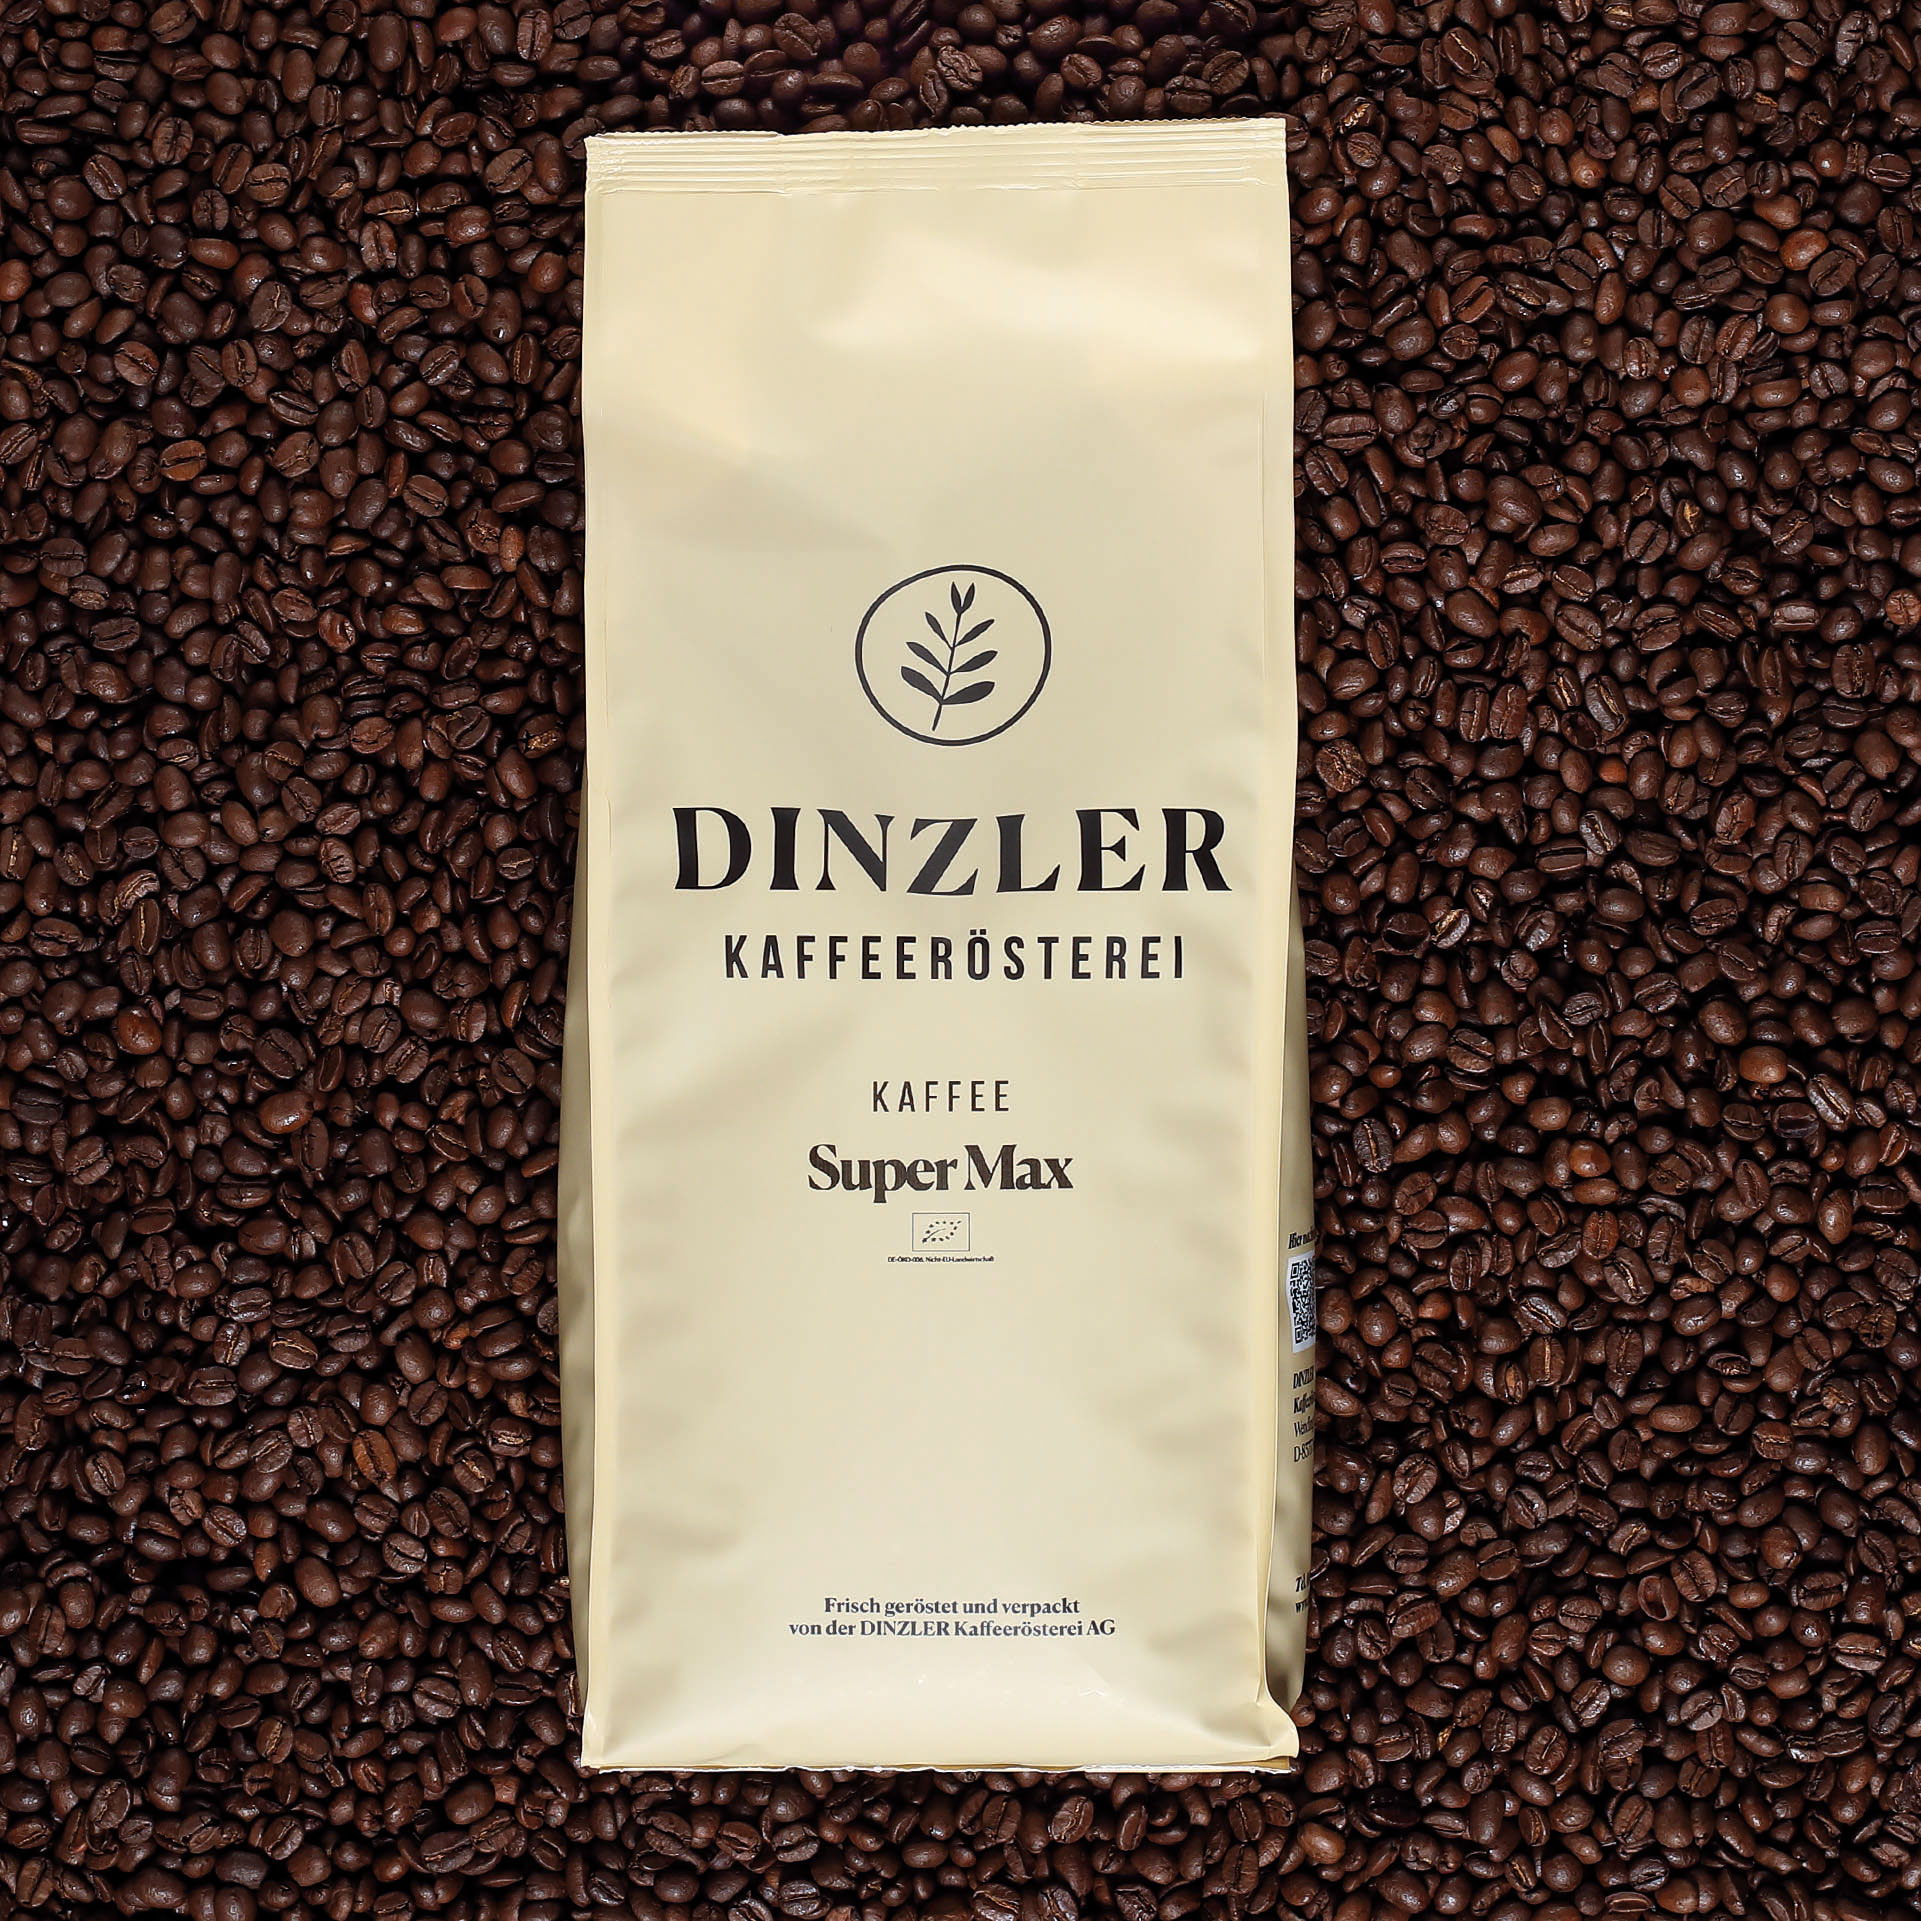 Kaffee Super Max | DINZLER Shop